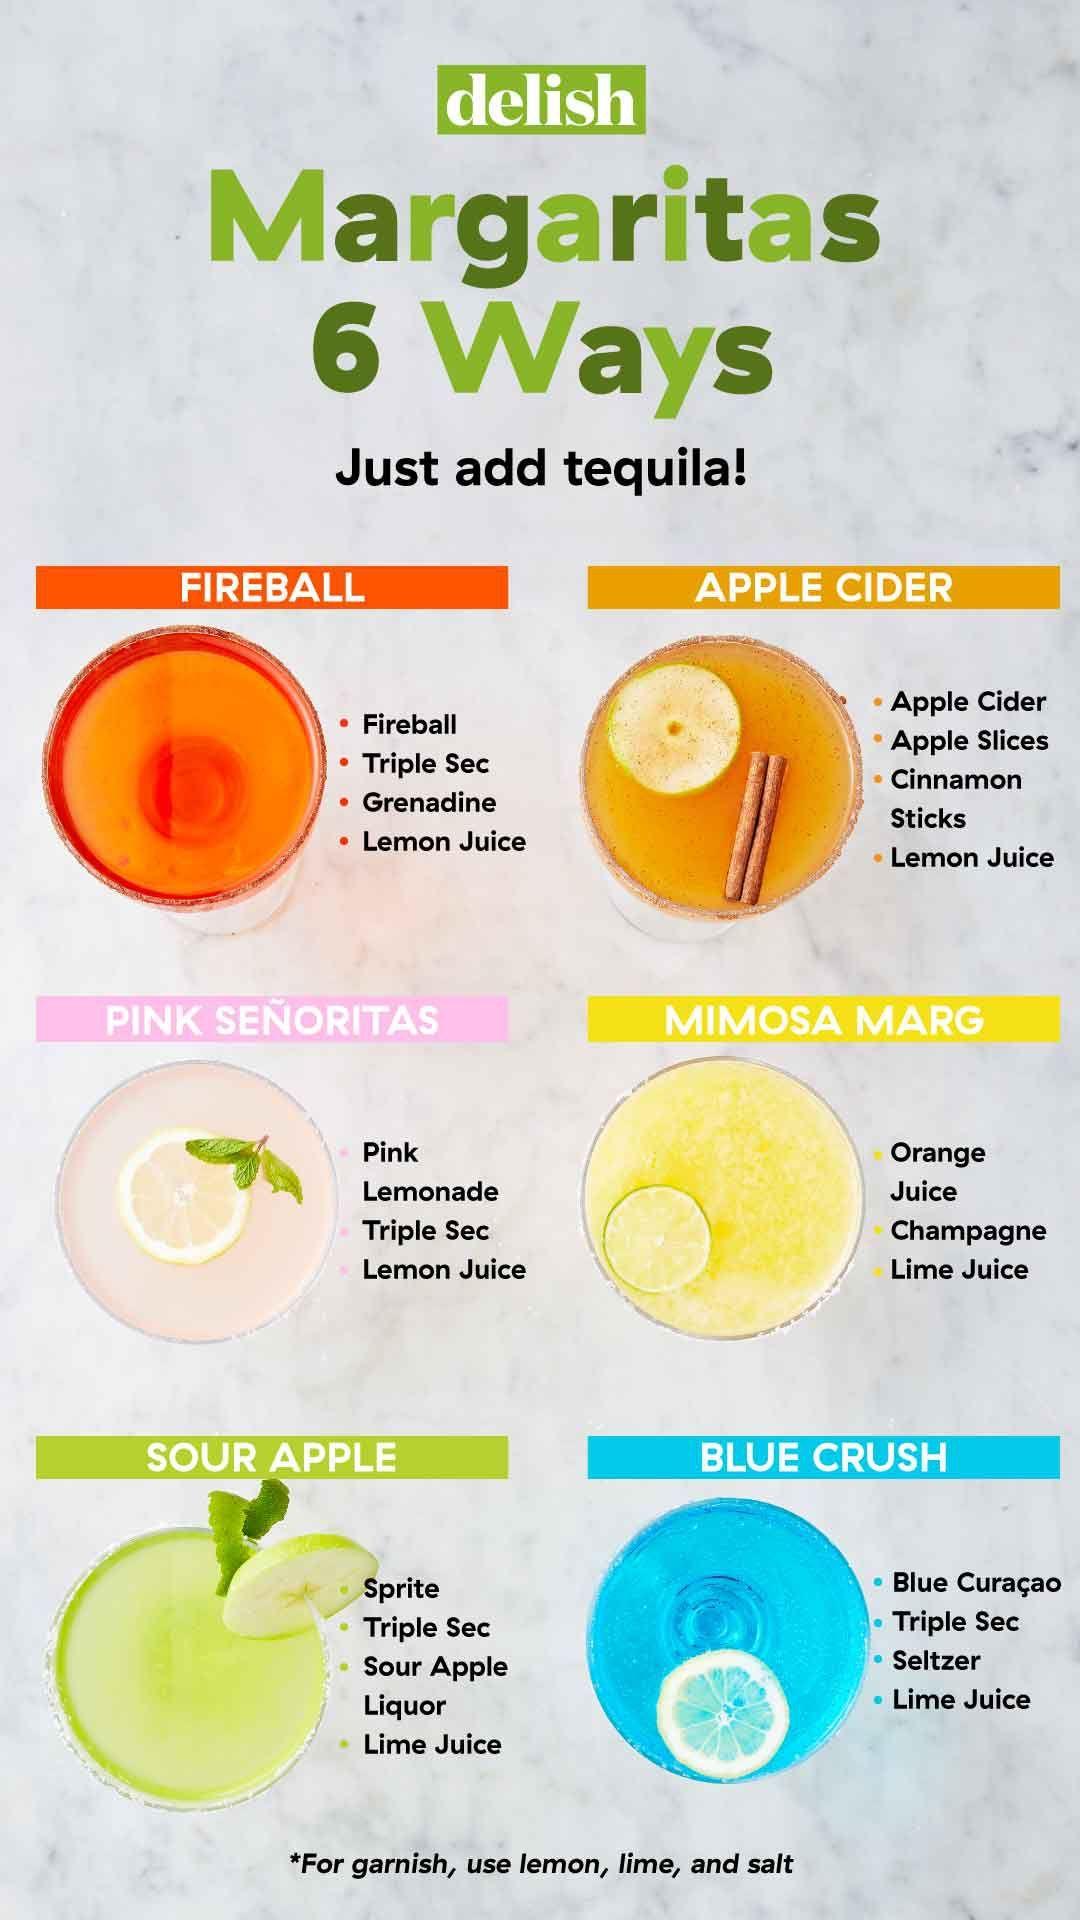 24 Totally Life-Changing Margarita Recipes